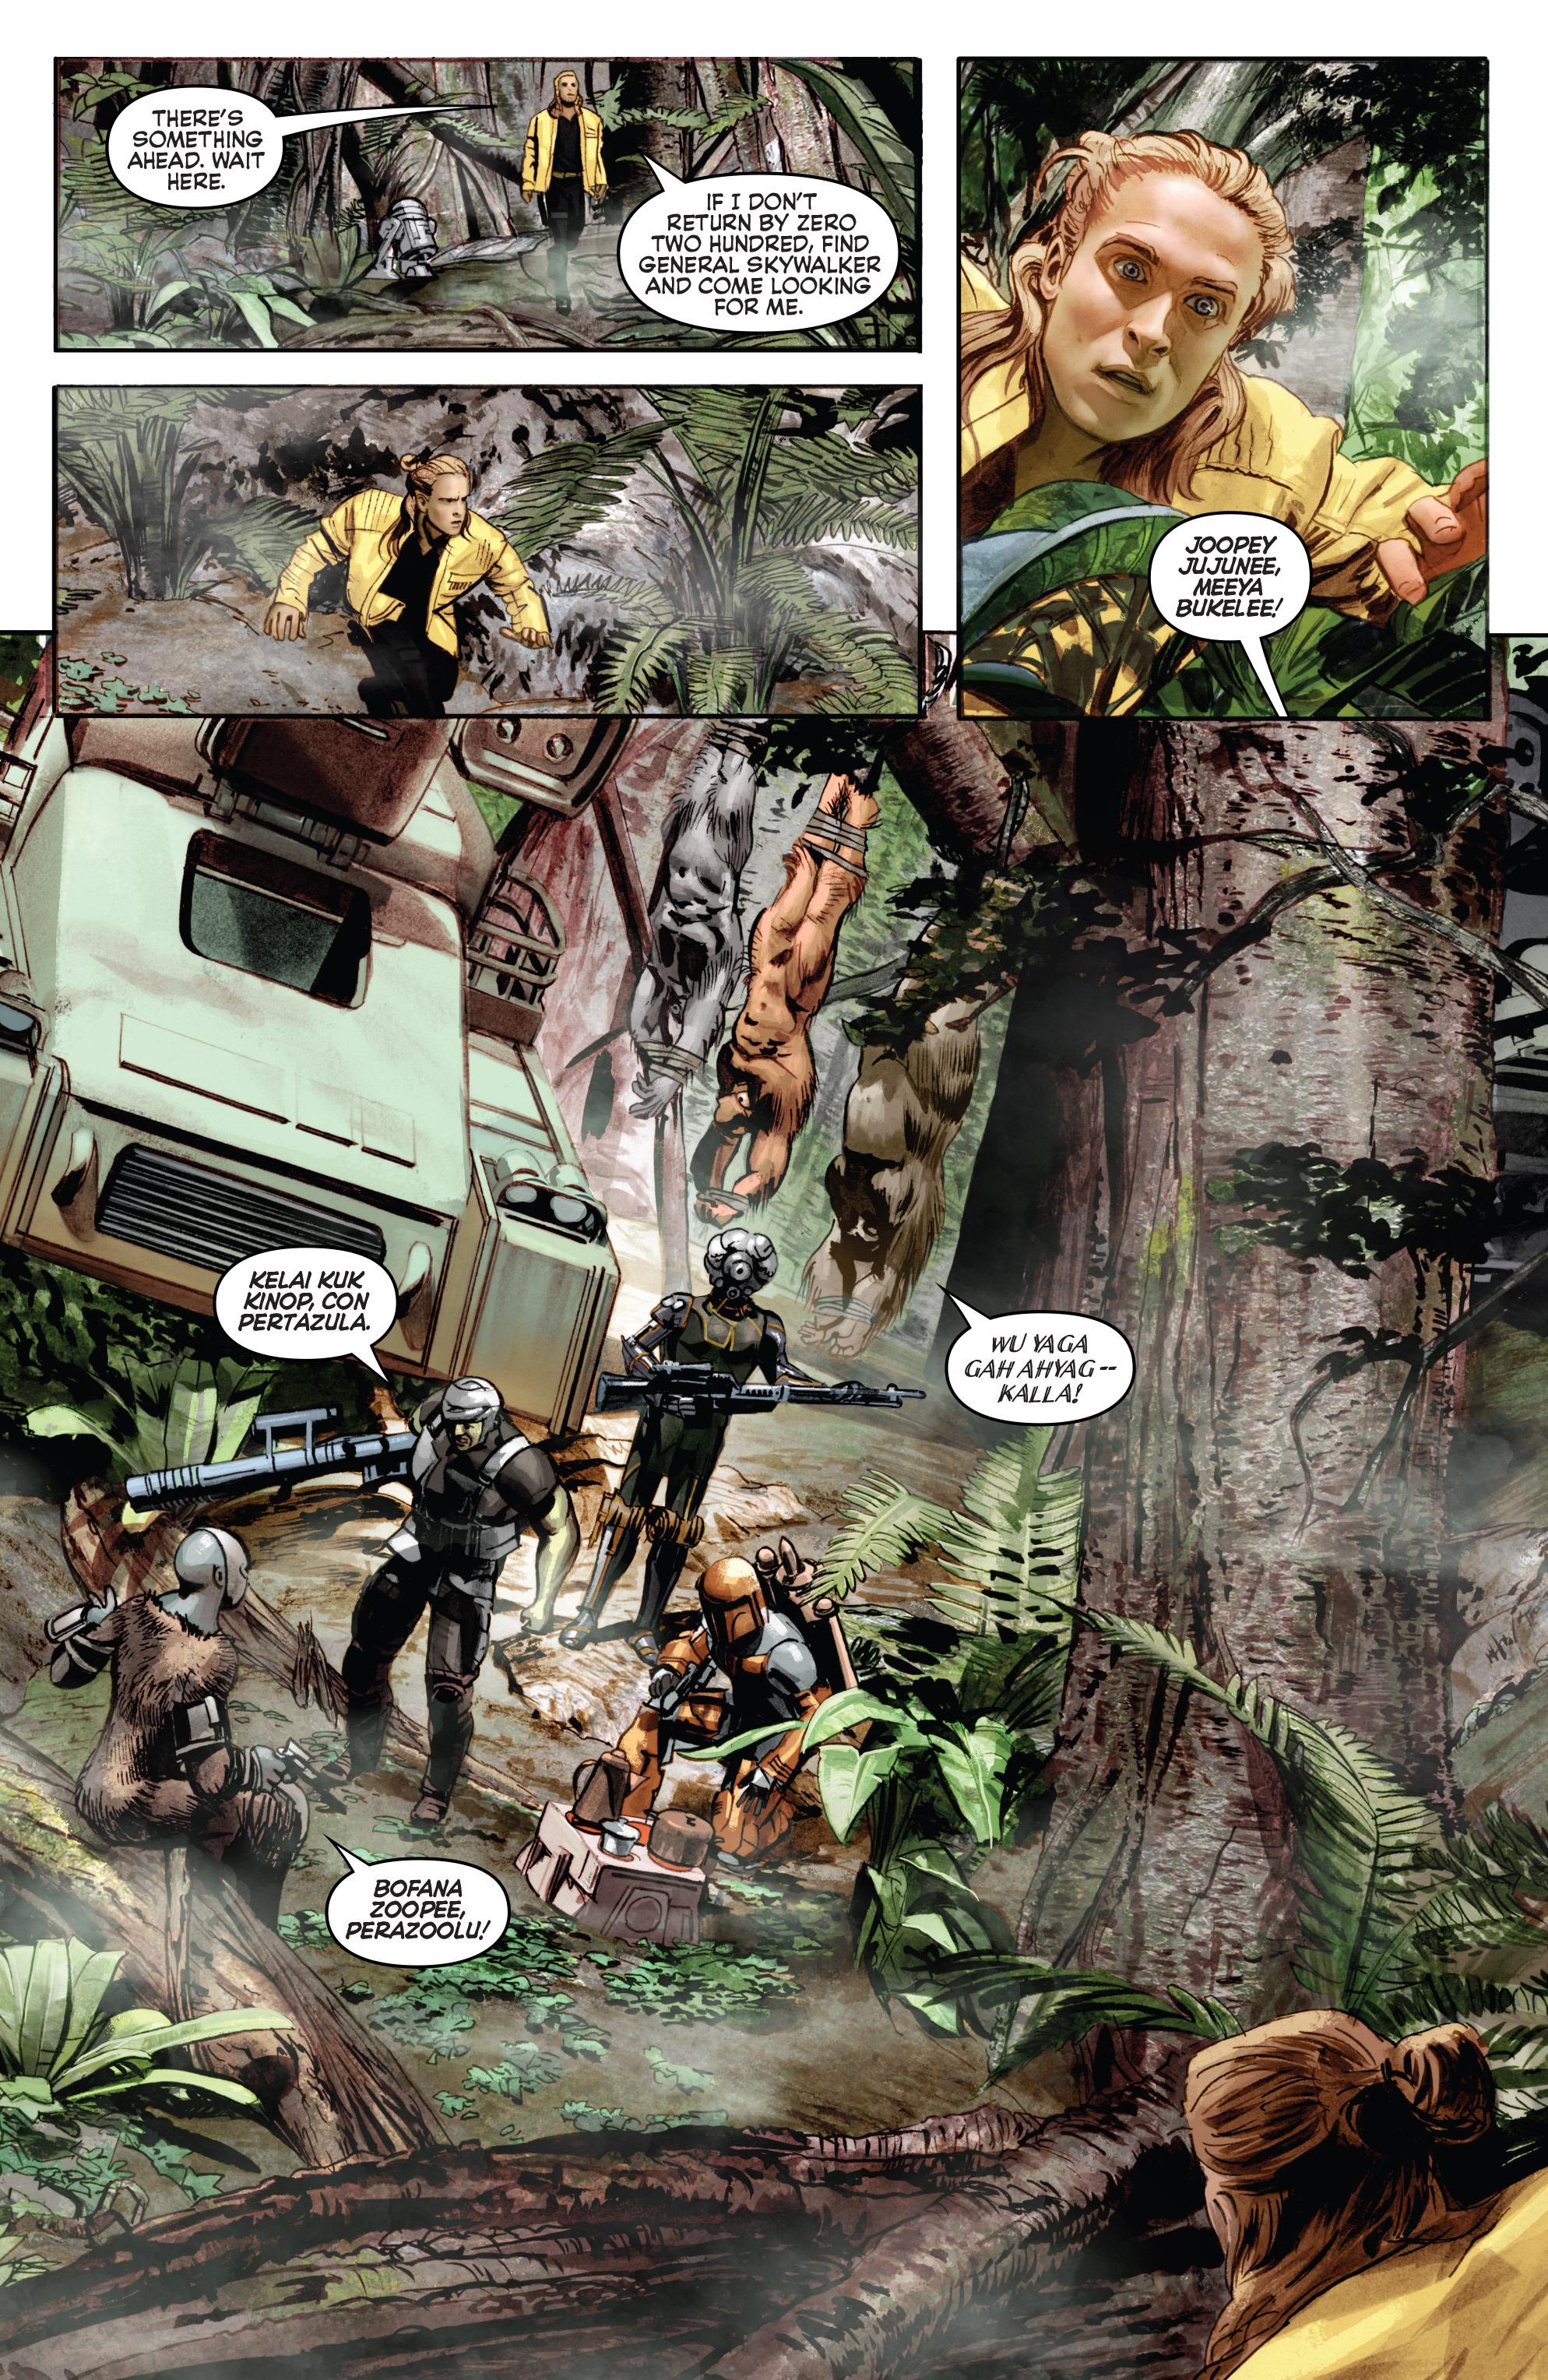 THE STAR WARS comic (2015, Marvel edition) Vol.7 16